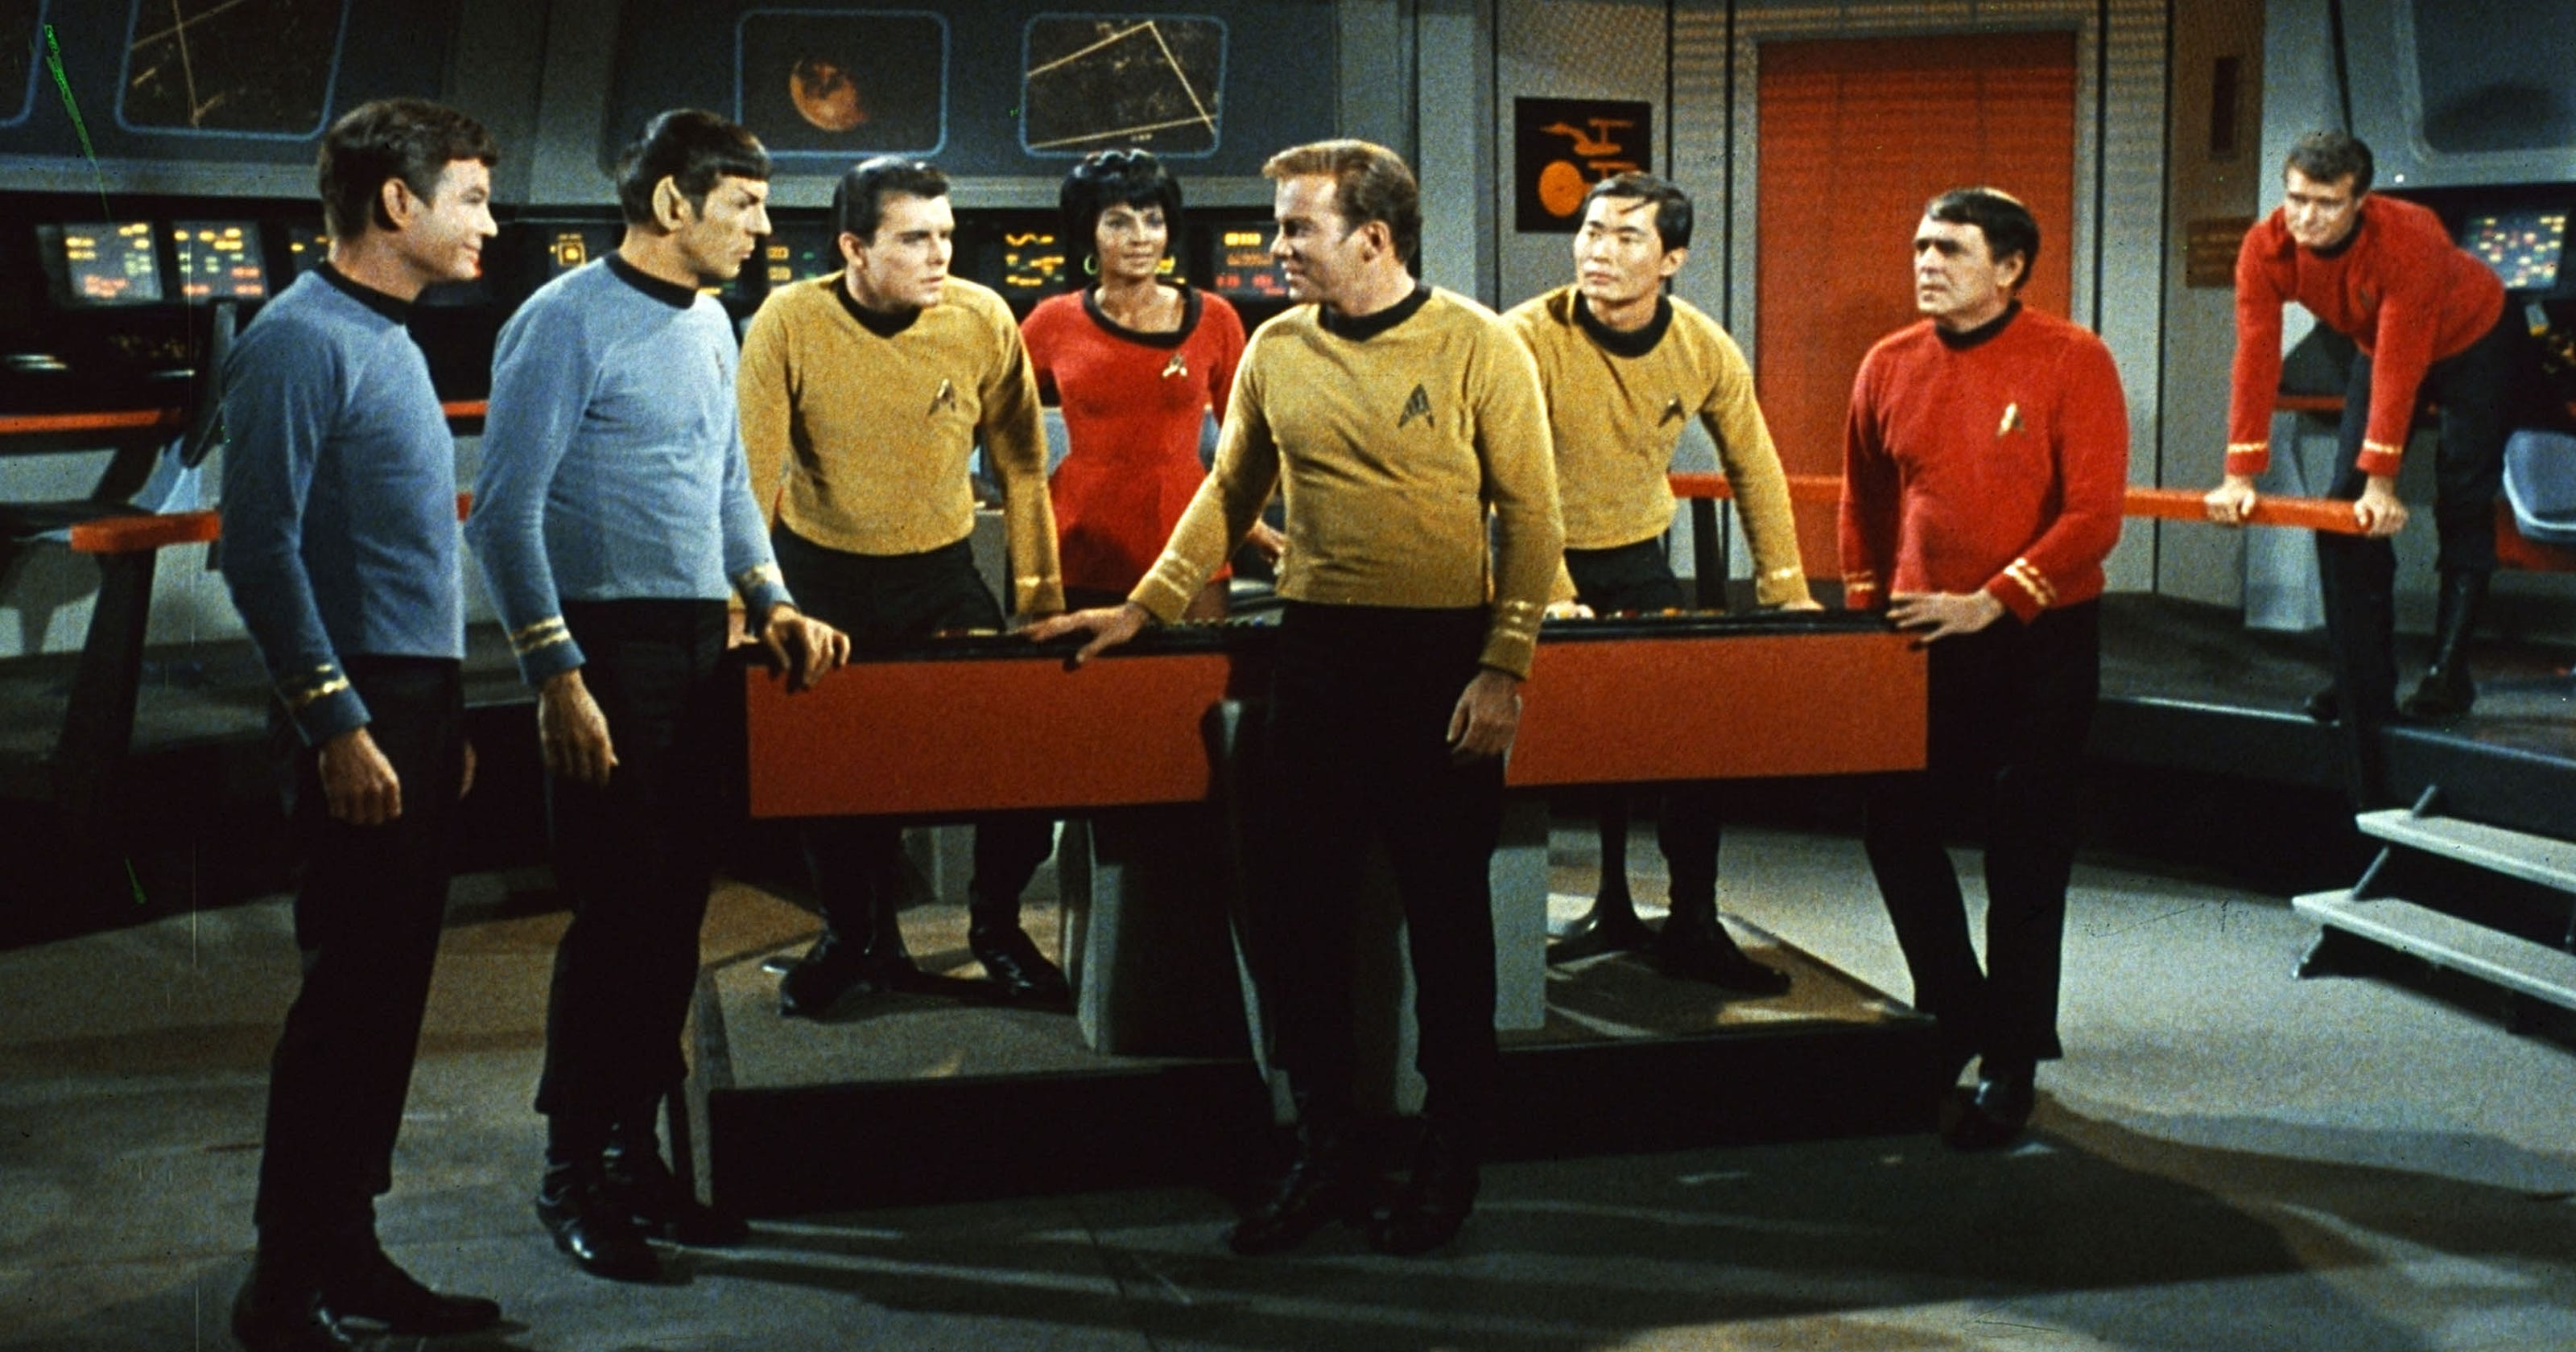 Photos: The evolution of 'Star Trek'